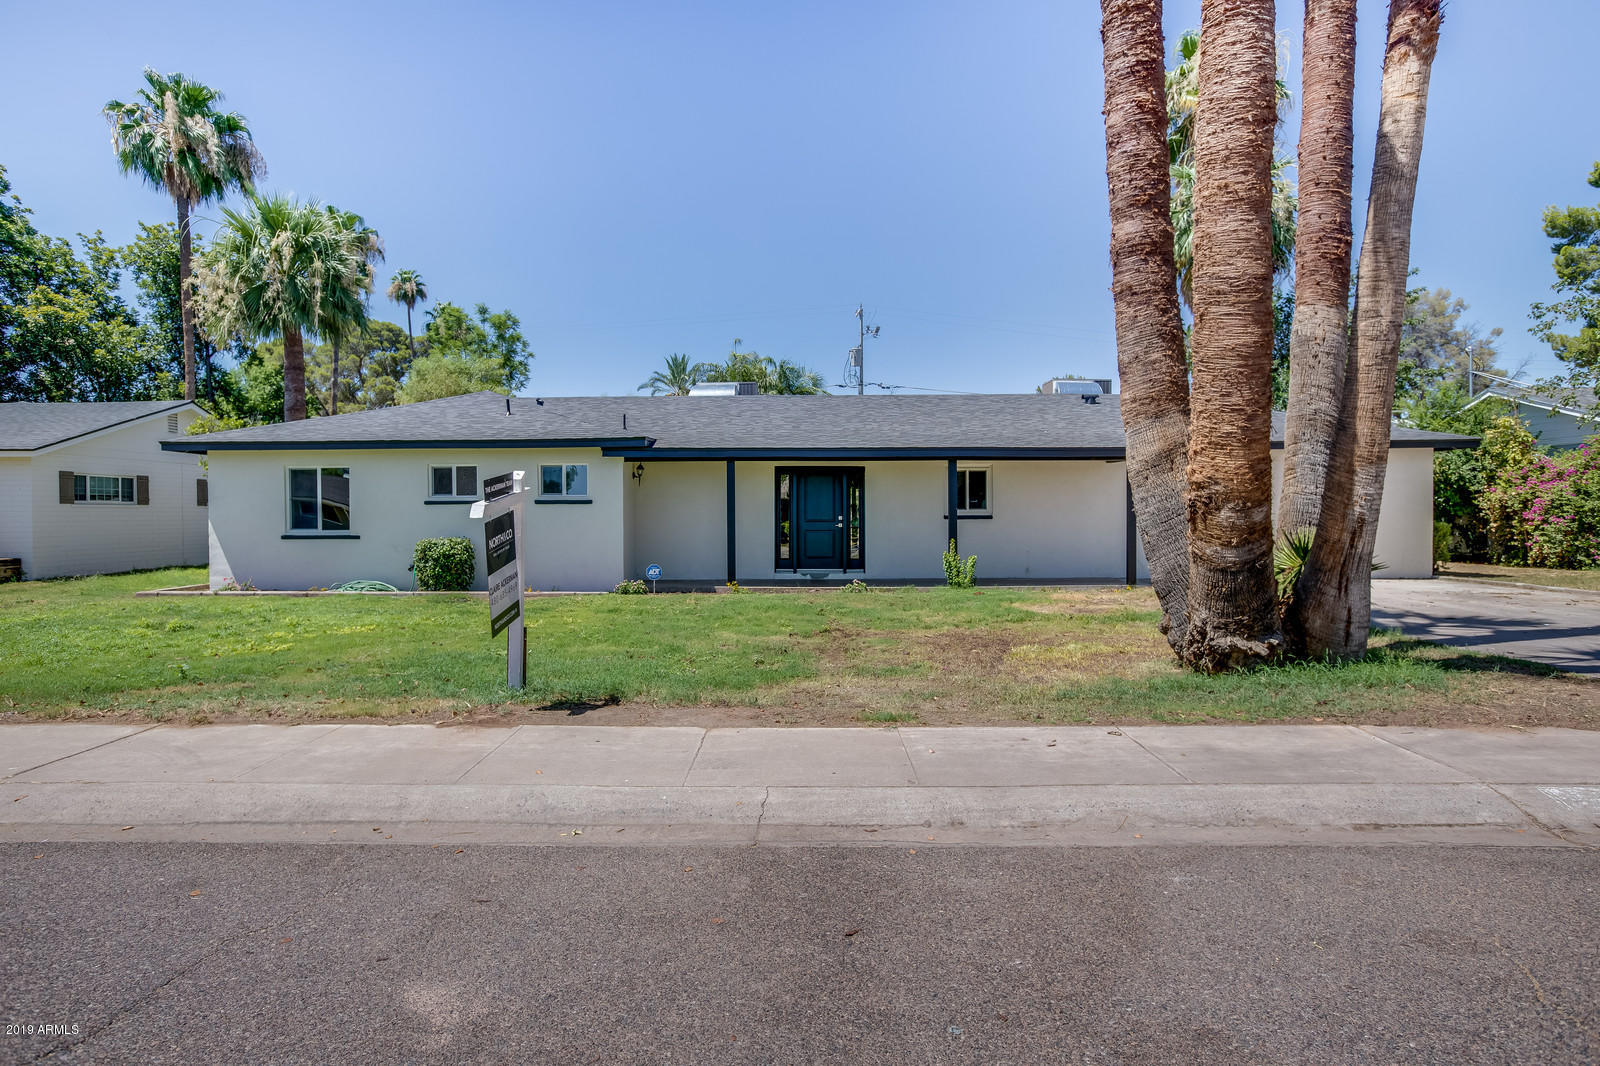 Photo of 1330 E VERMONT Avenue, Phoenix, AZ 85014